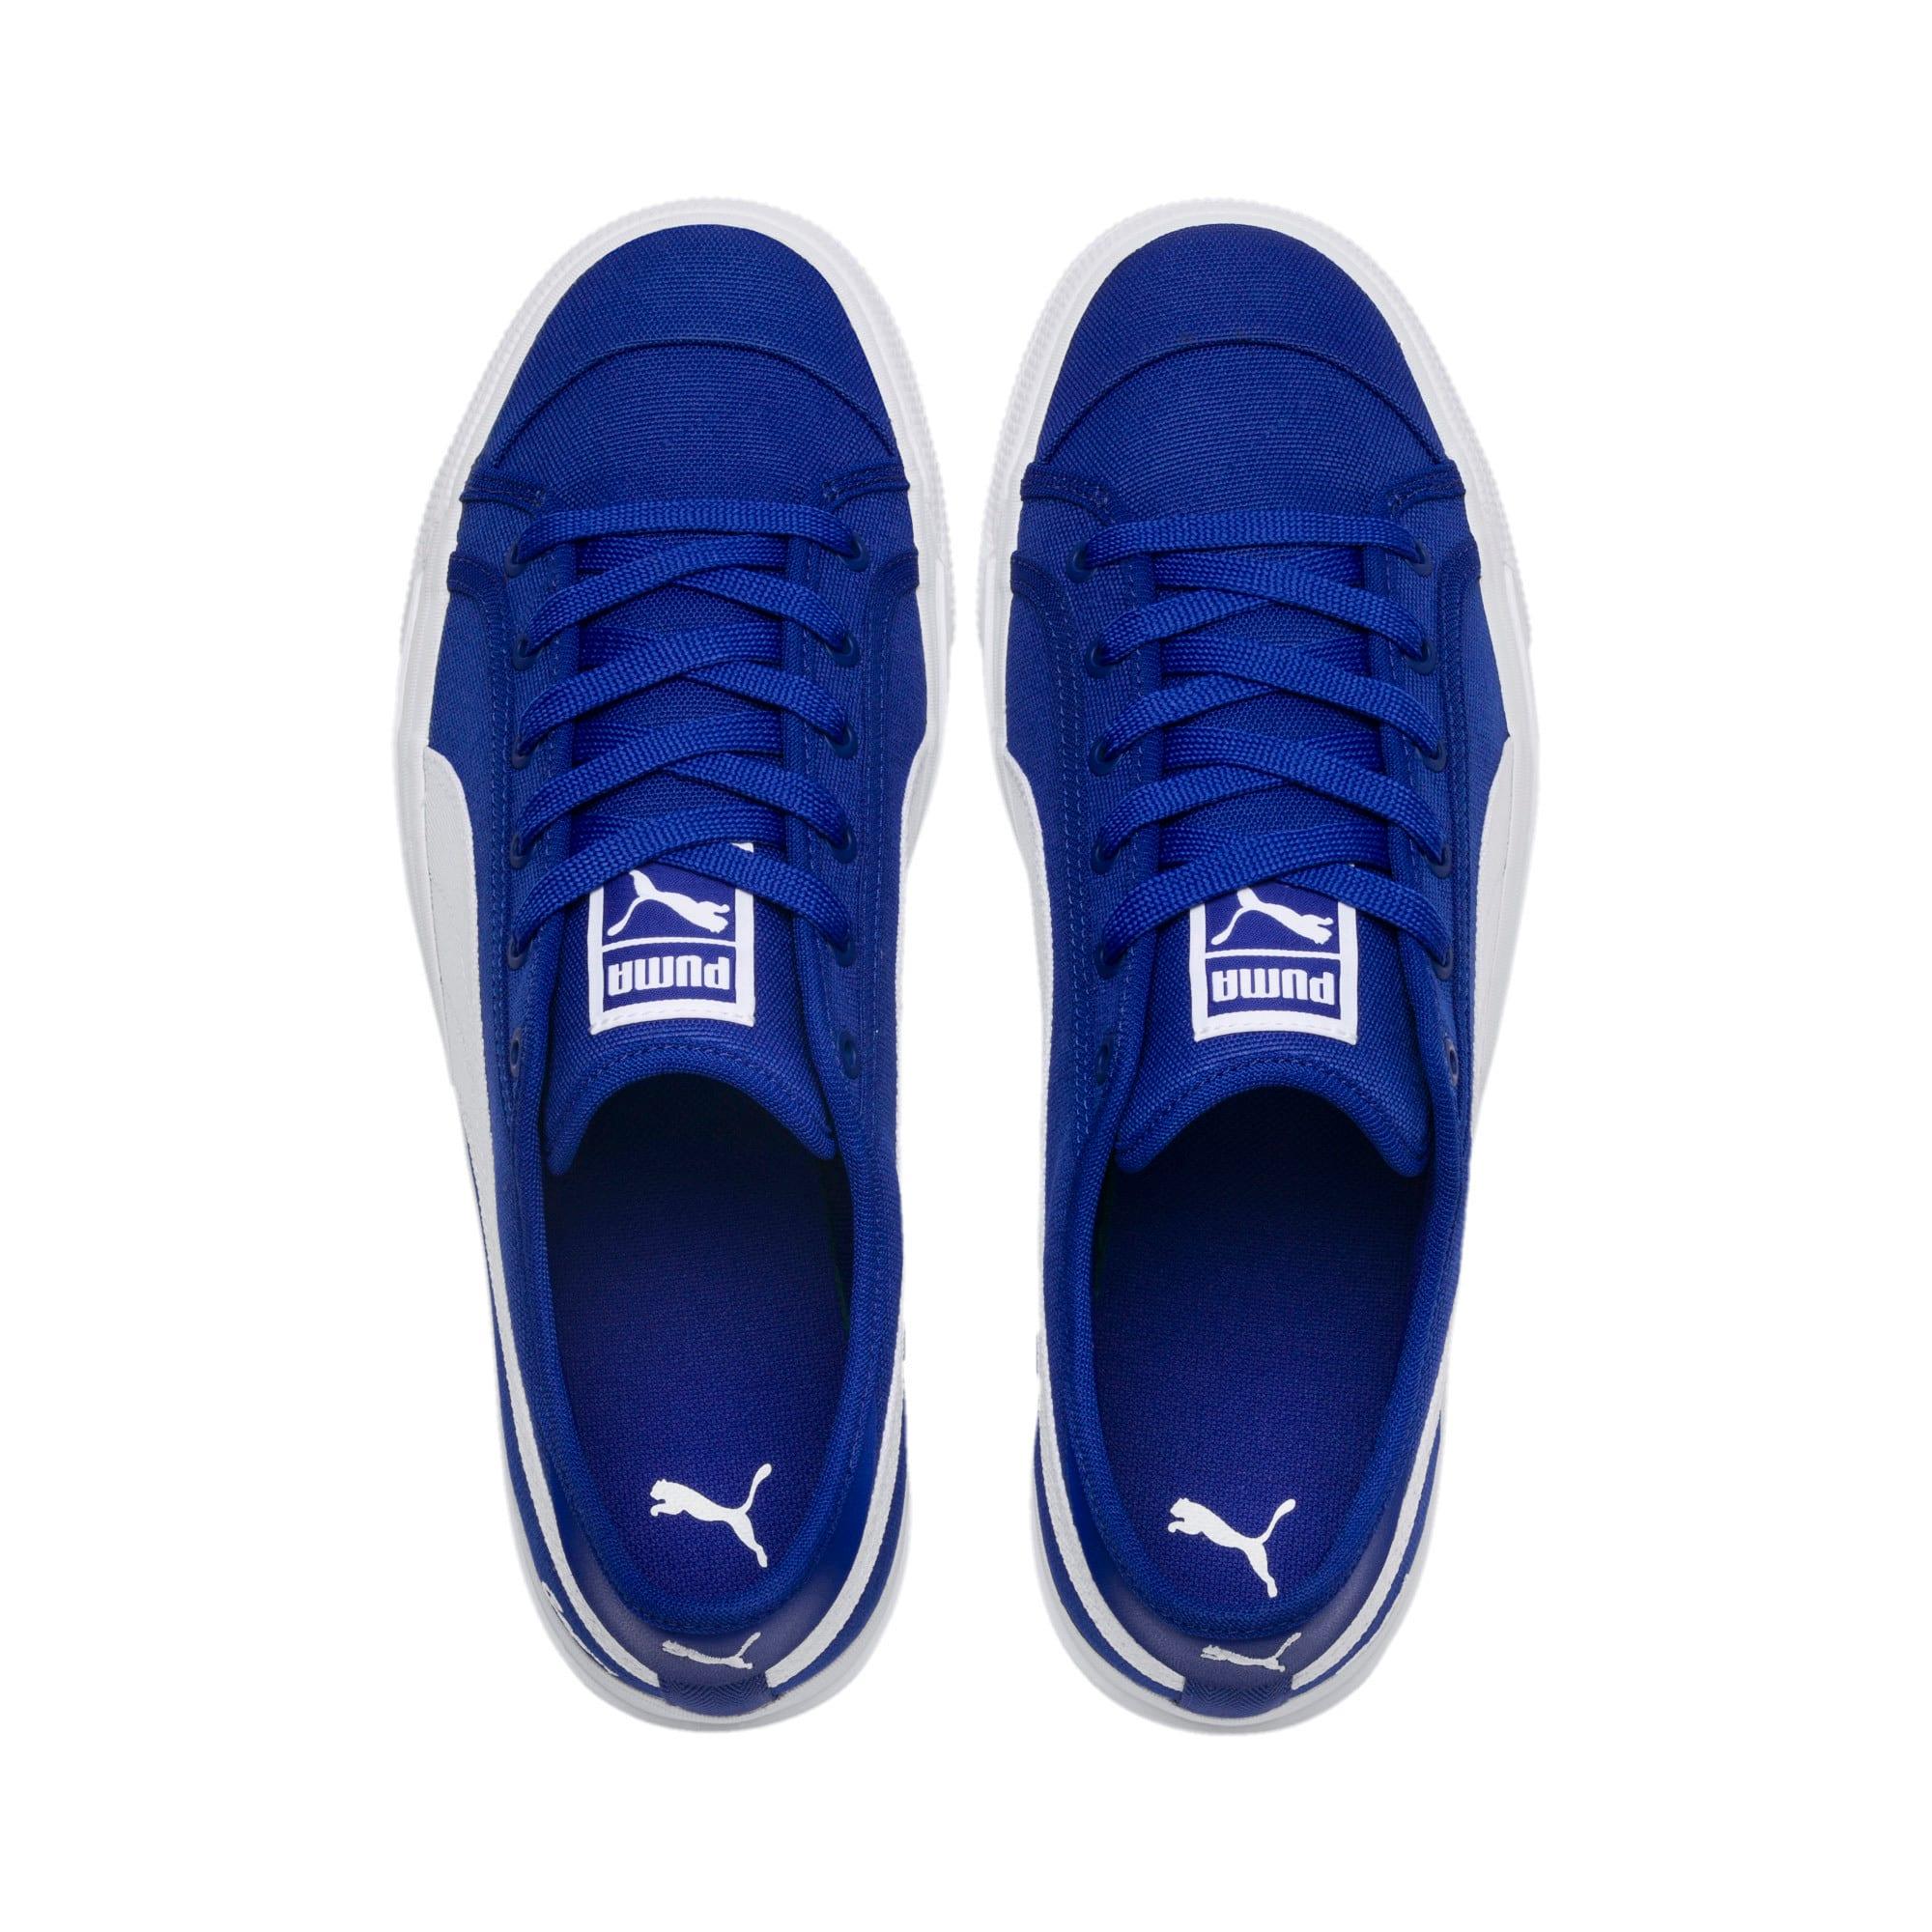 Thumbnail 6 of Capri Tennis Shoes, Surf DWeb-Puma Wht-Puma Wht, medium-IND